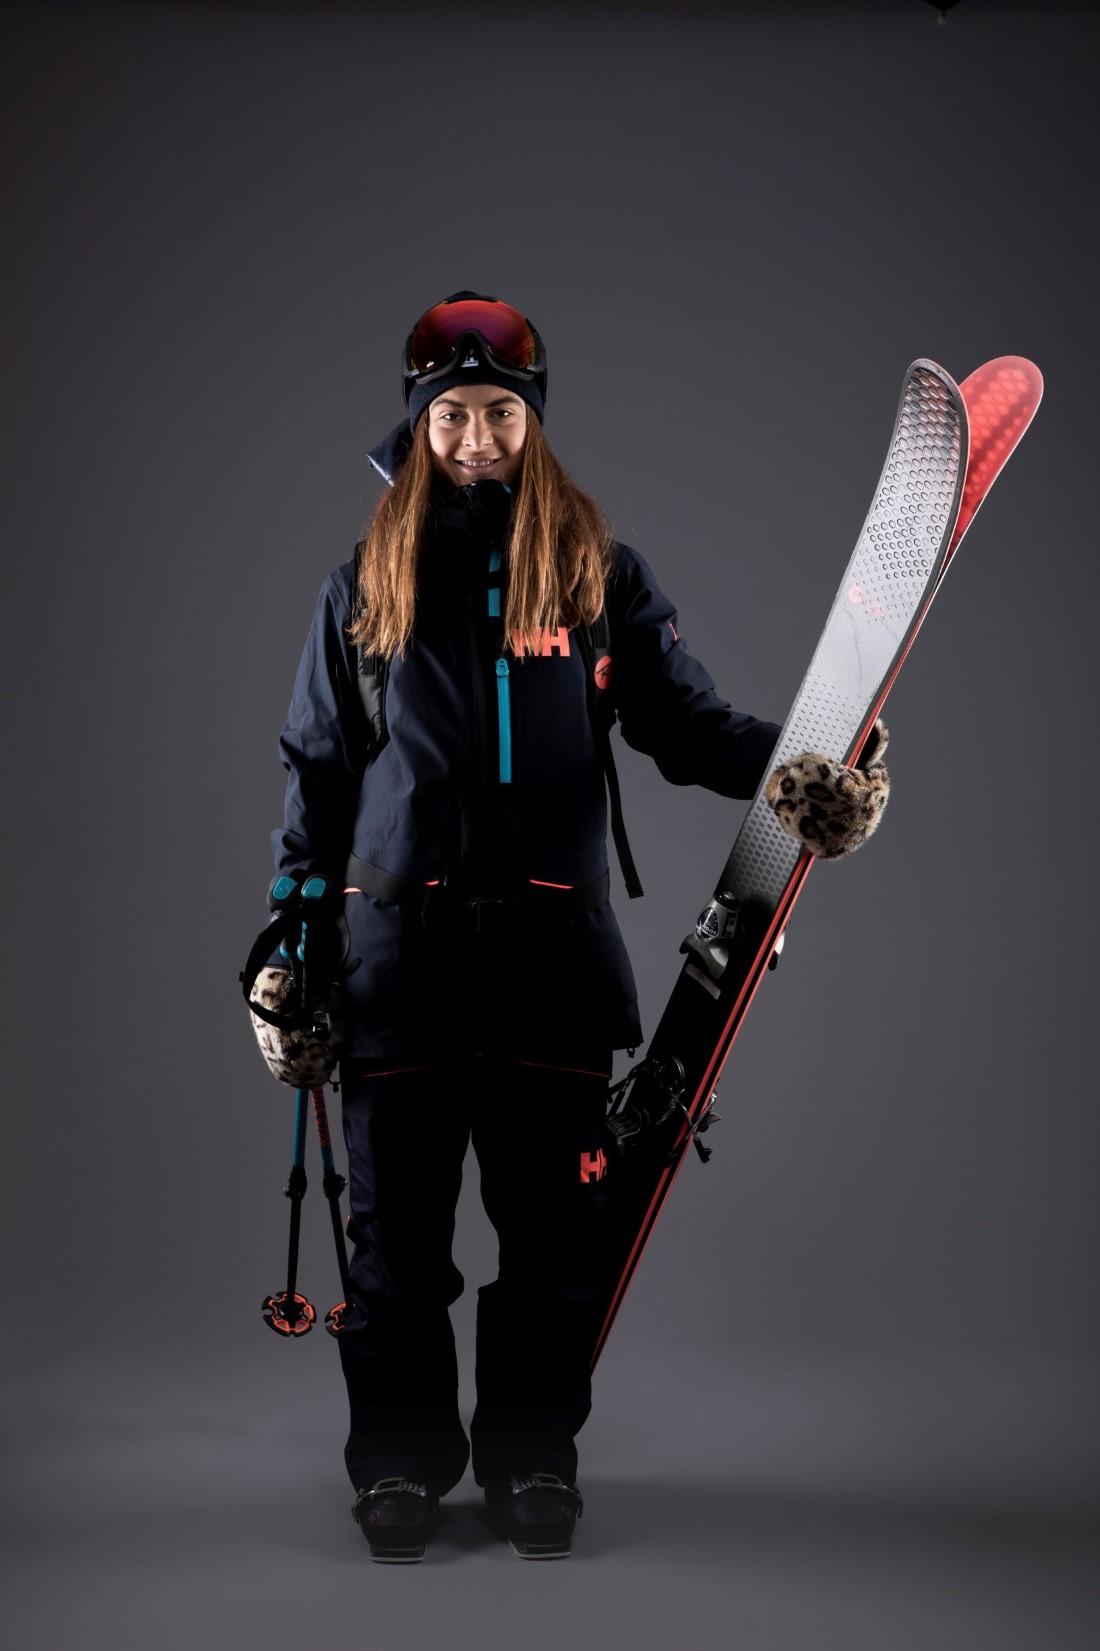 Alpina - Freeride World Tour 2021 - Juliette Willmann